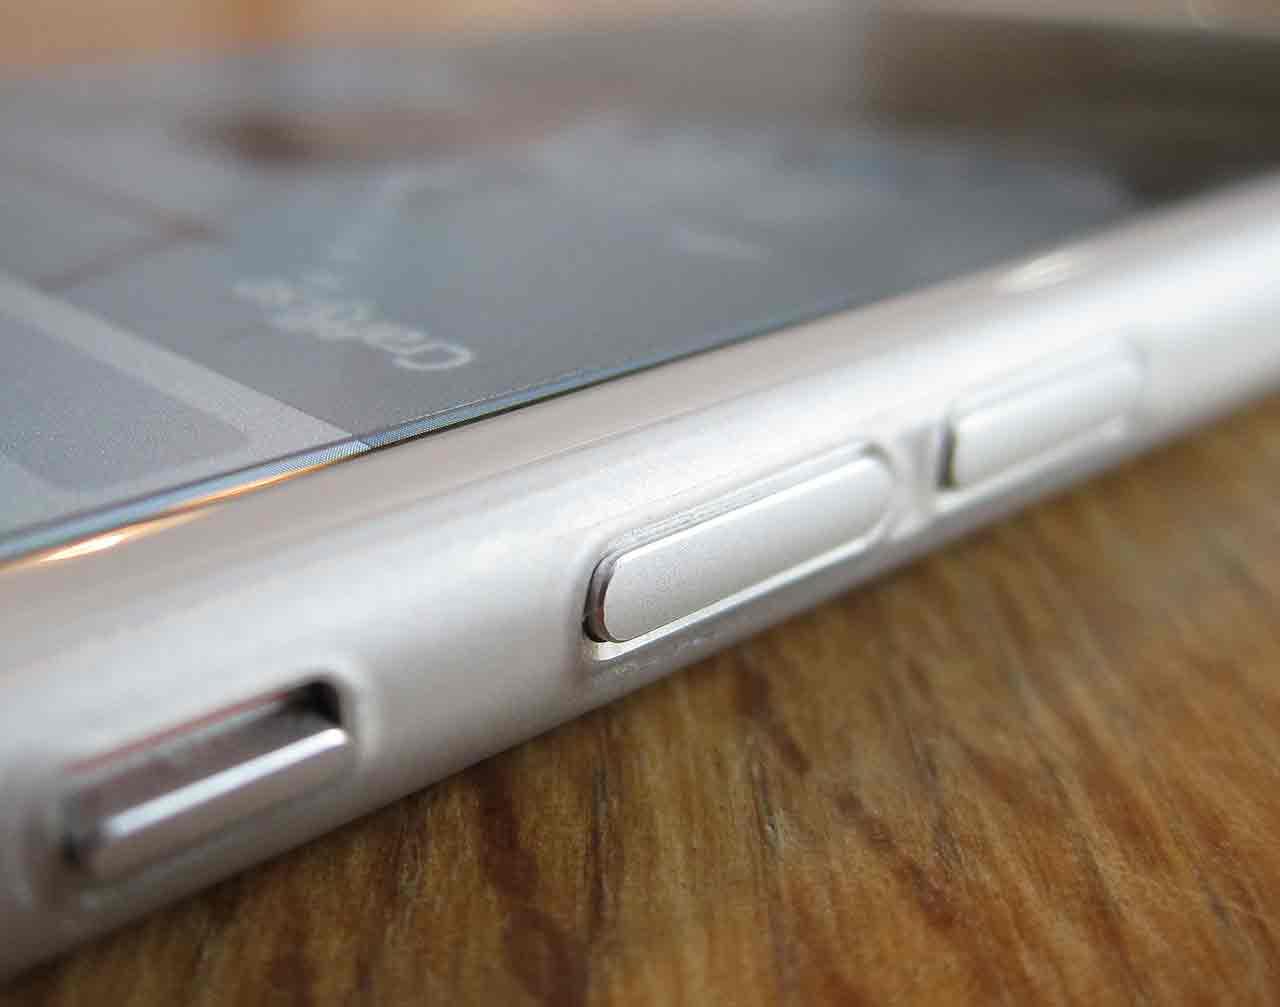 Världens tunnaste iPhone-skal